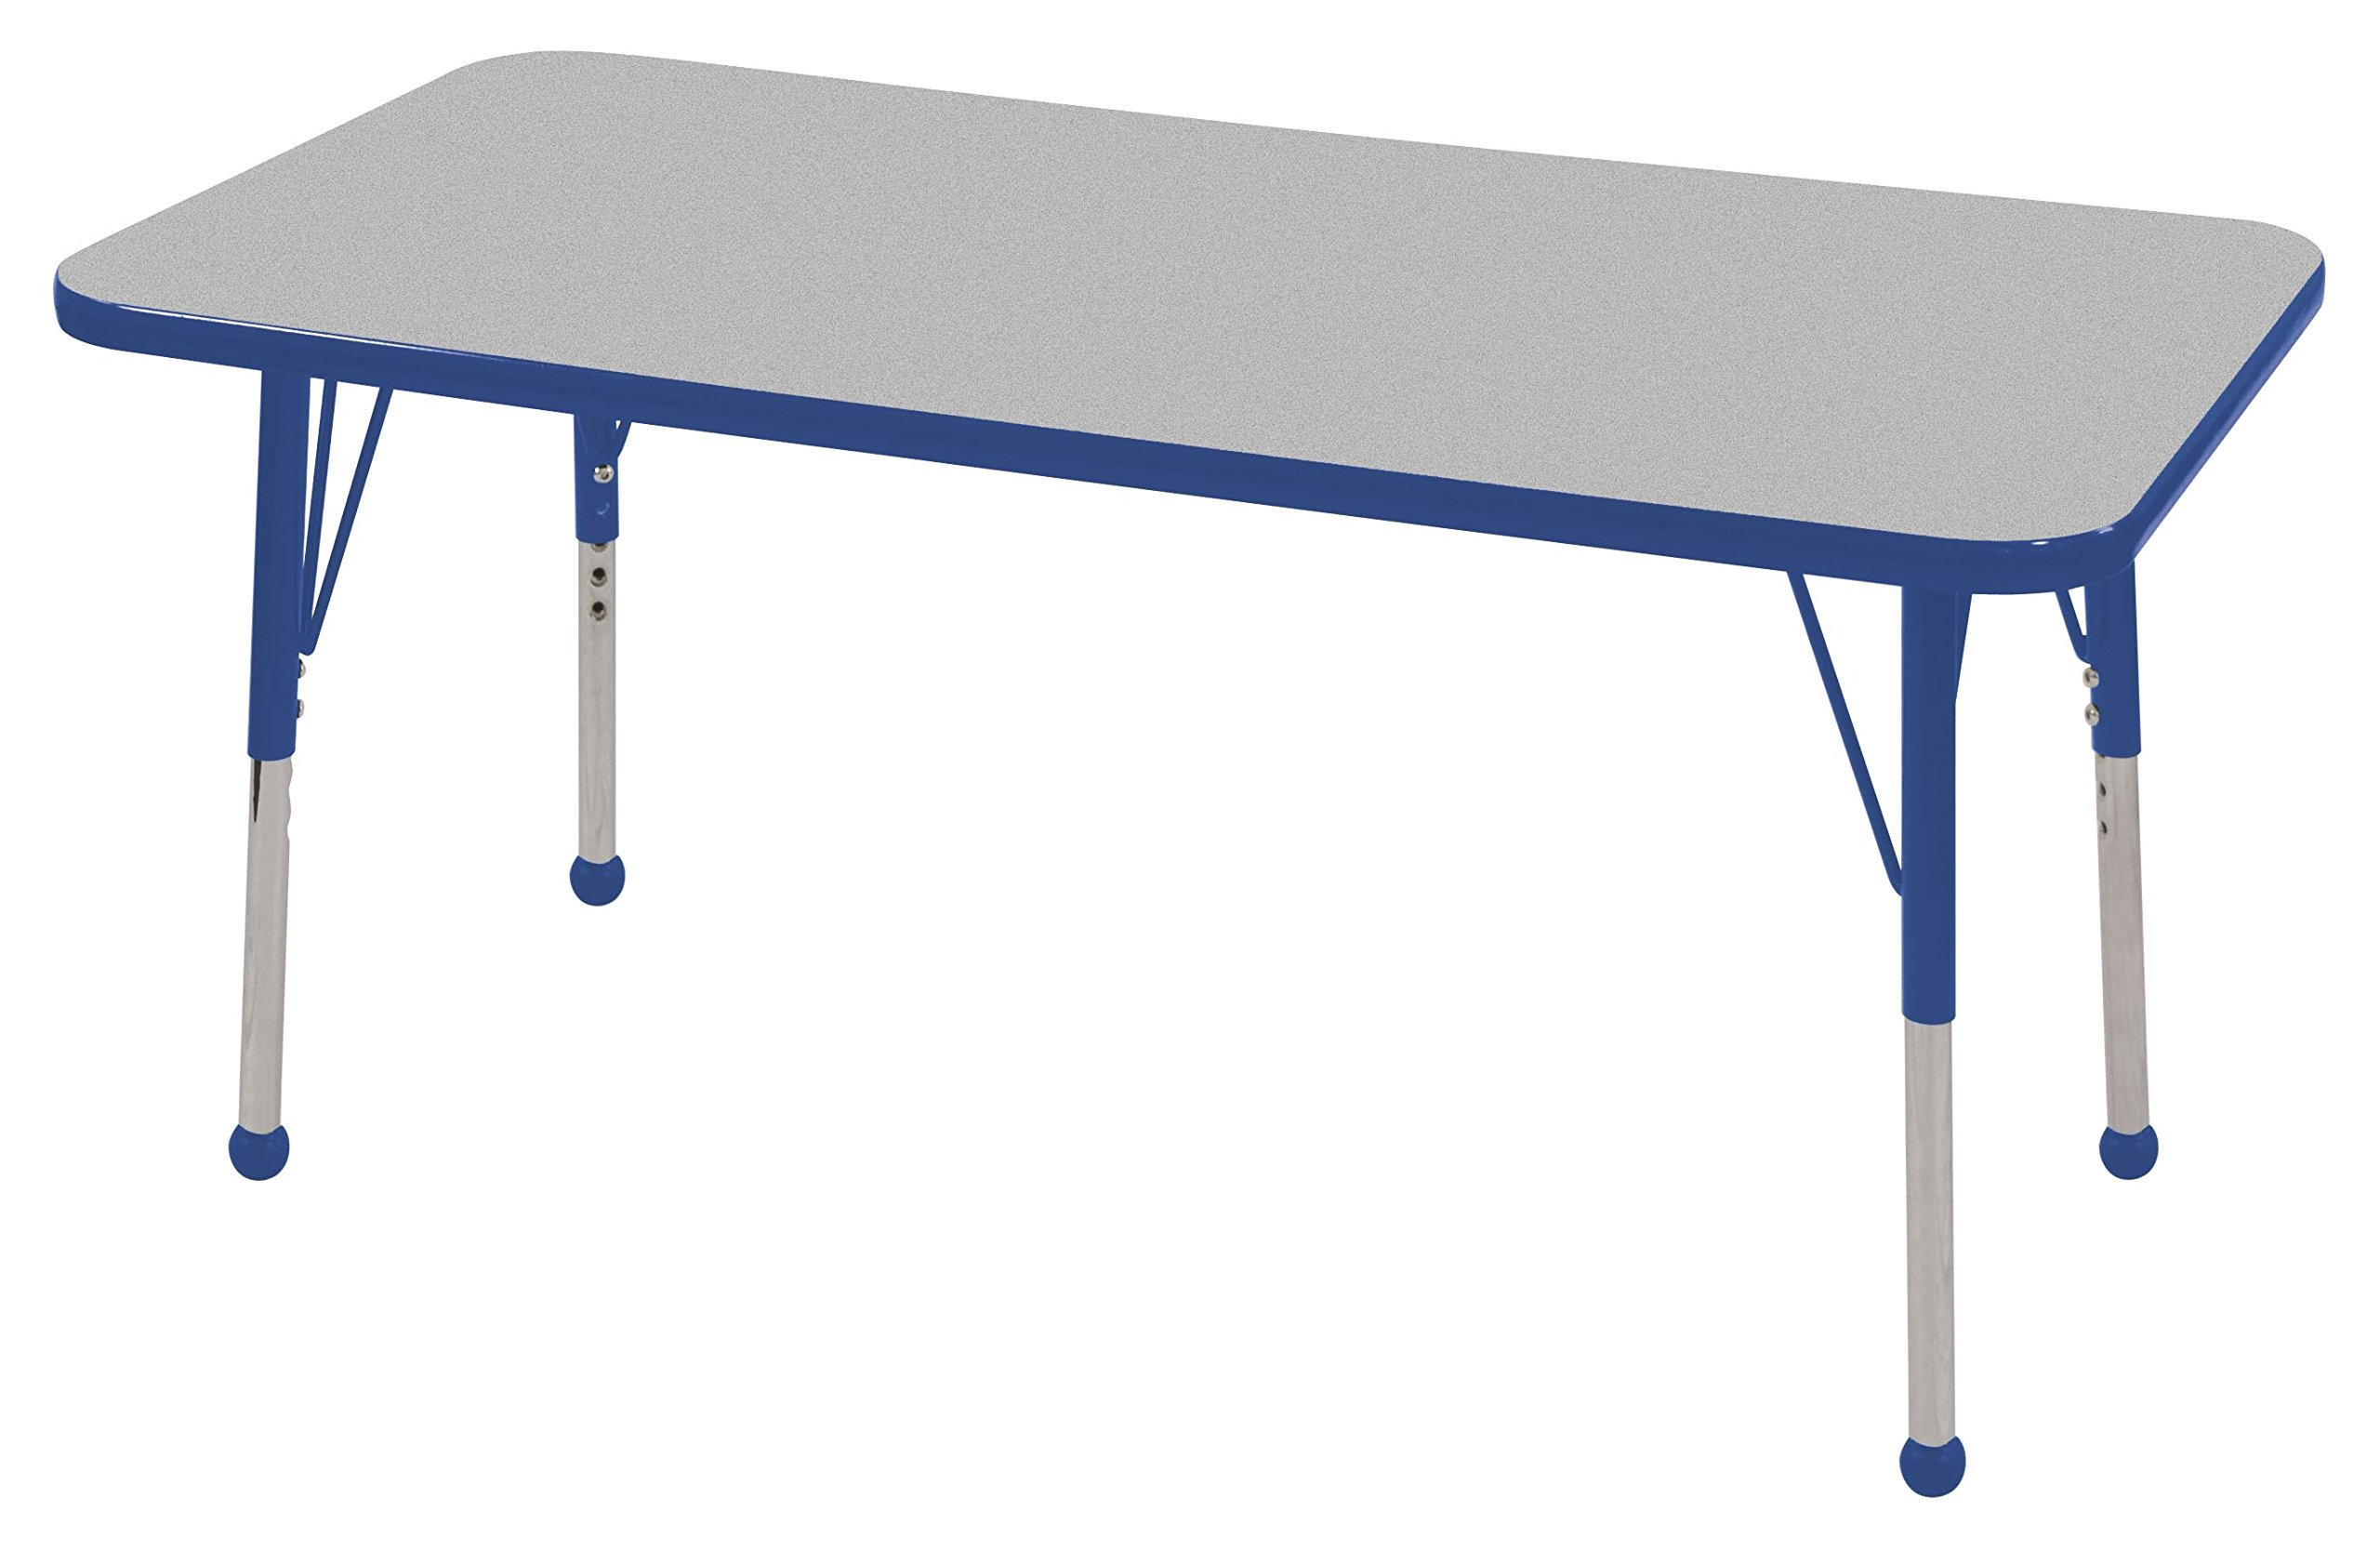 ECR4Kids 24'' x 48'' Rectangular Activity School Table, Standard Legs w/Ball Glides, Adjustable Height 19-30 inch (Grey/Blue)